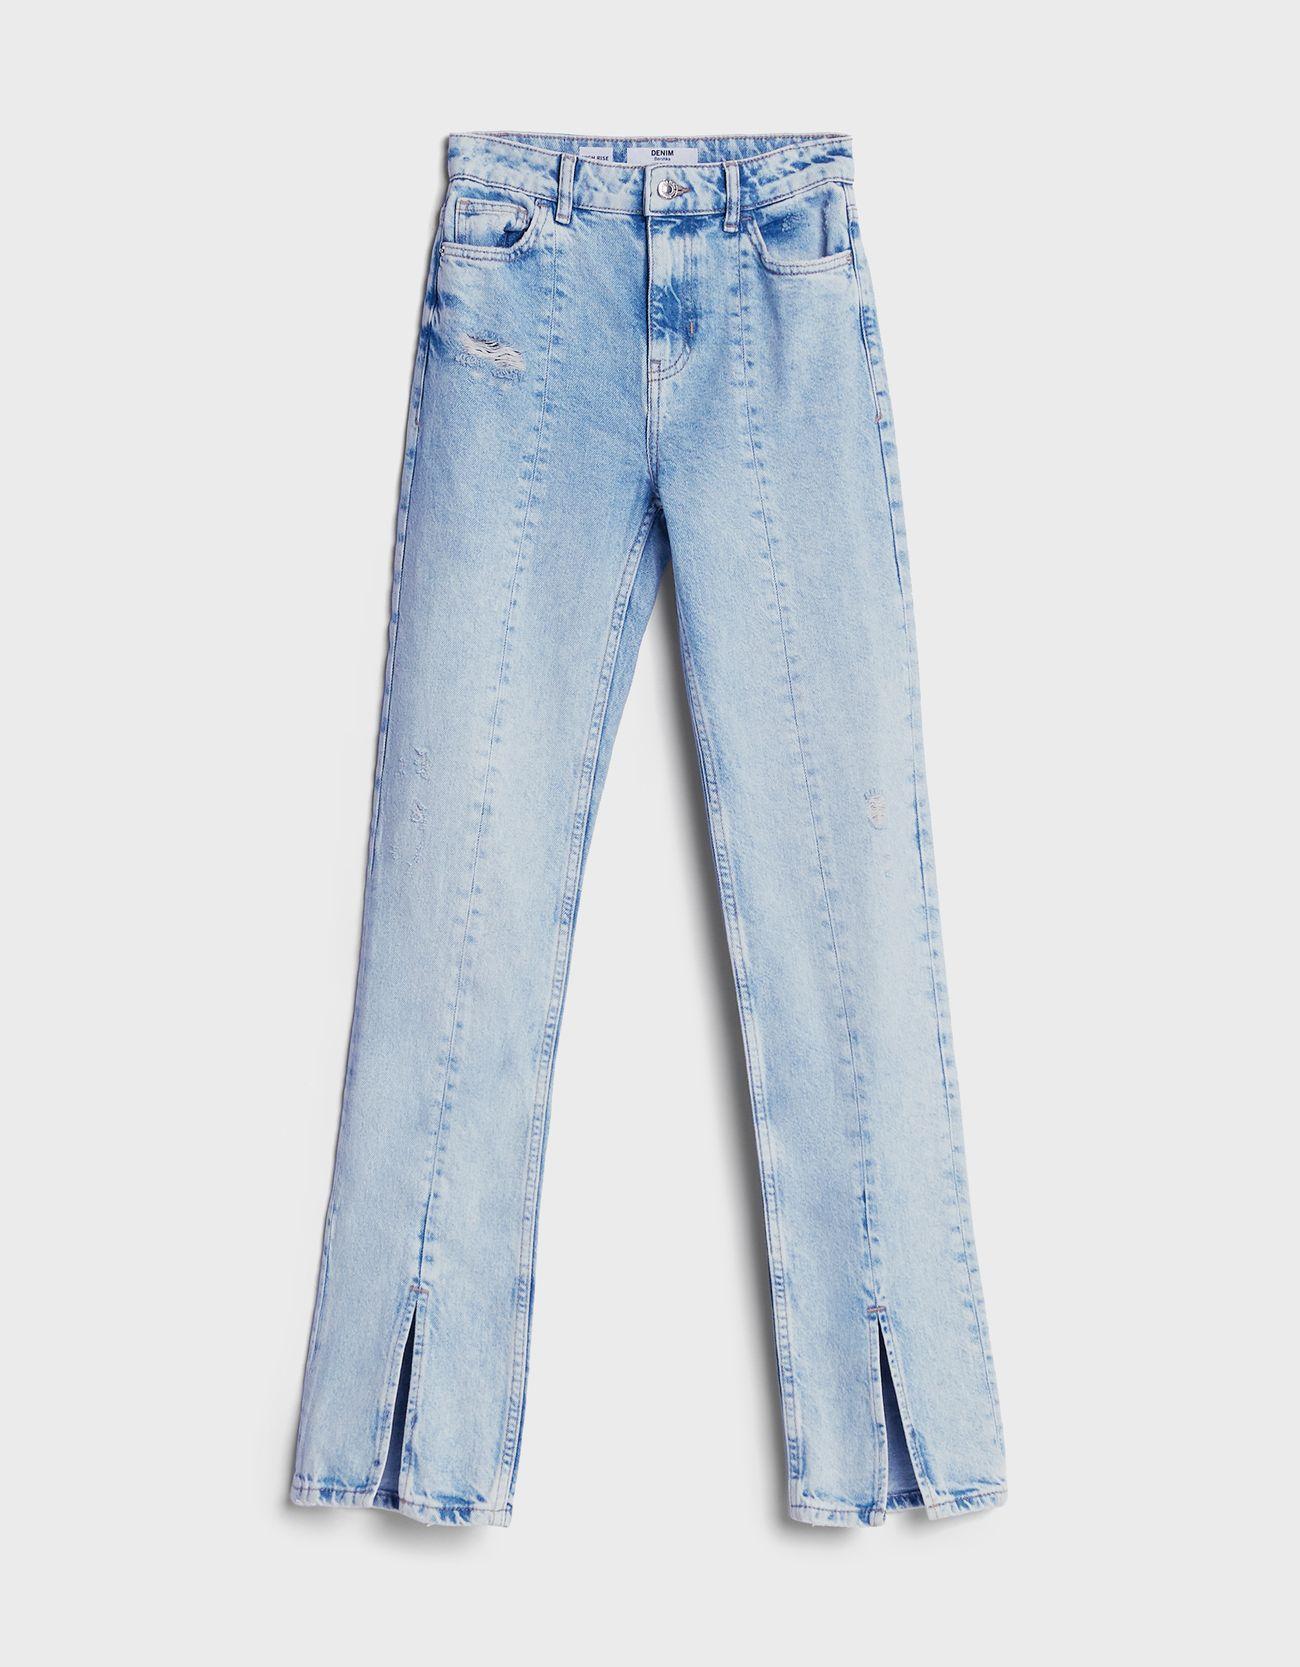 Jeans abertura bajo.